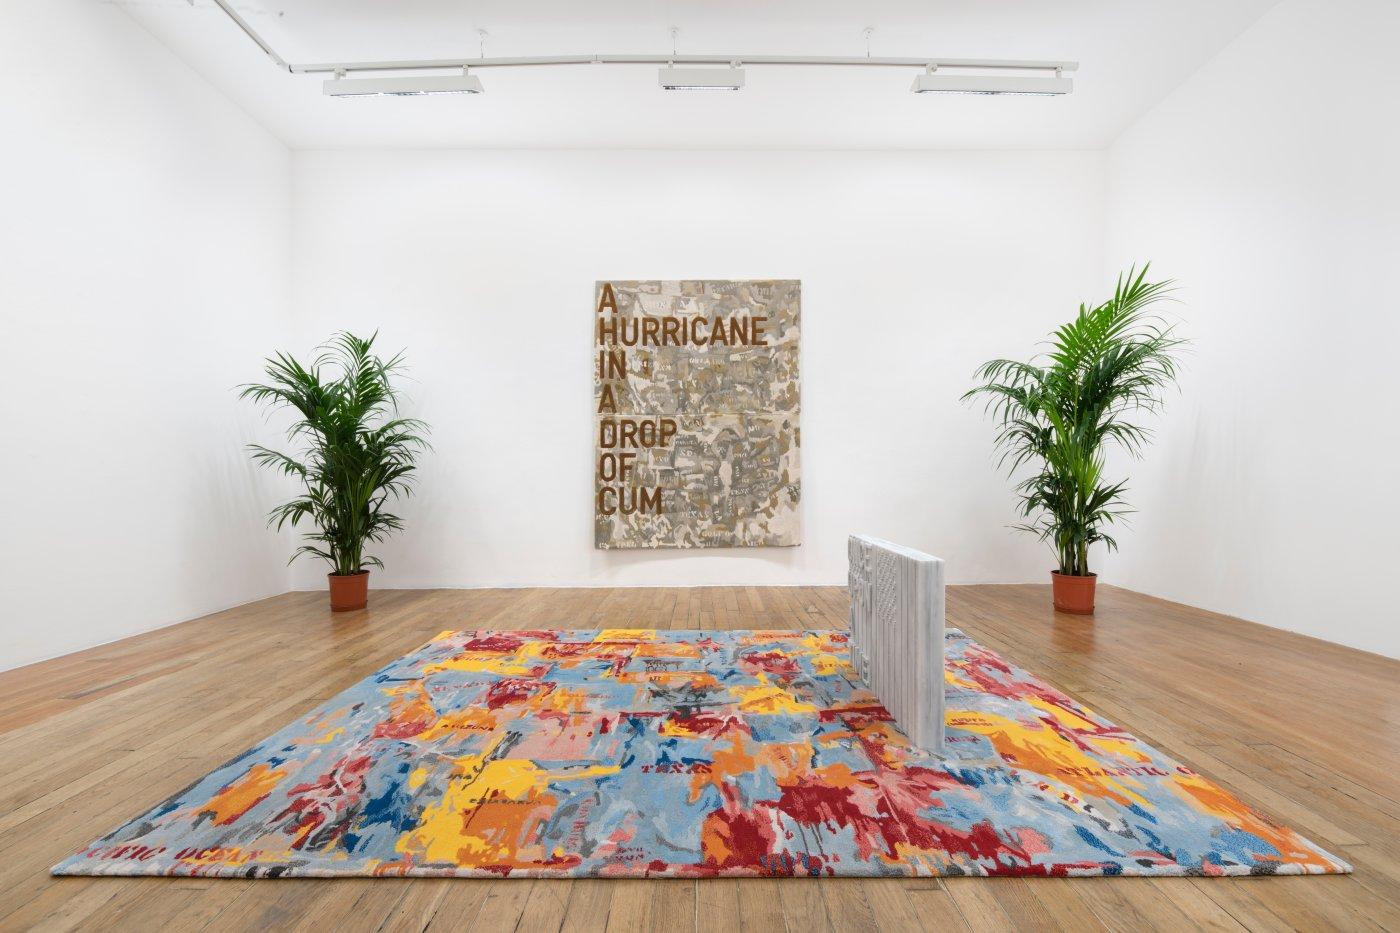 Galerie Chantal Crousel Rirkrit Tiravanija 5